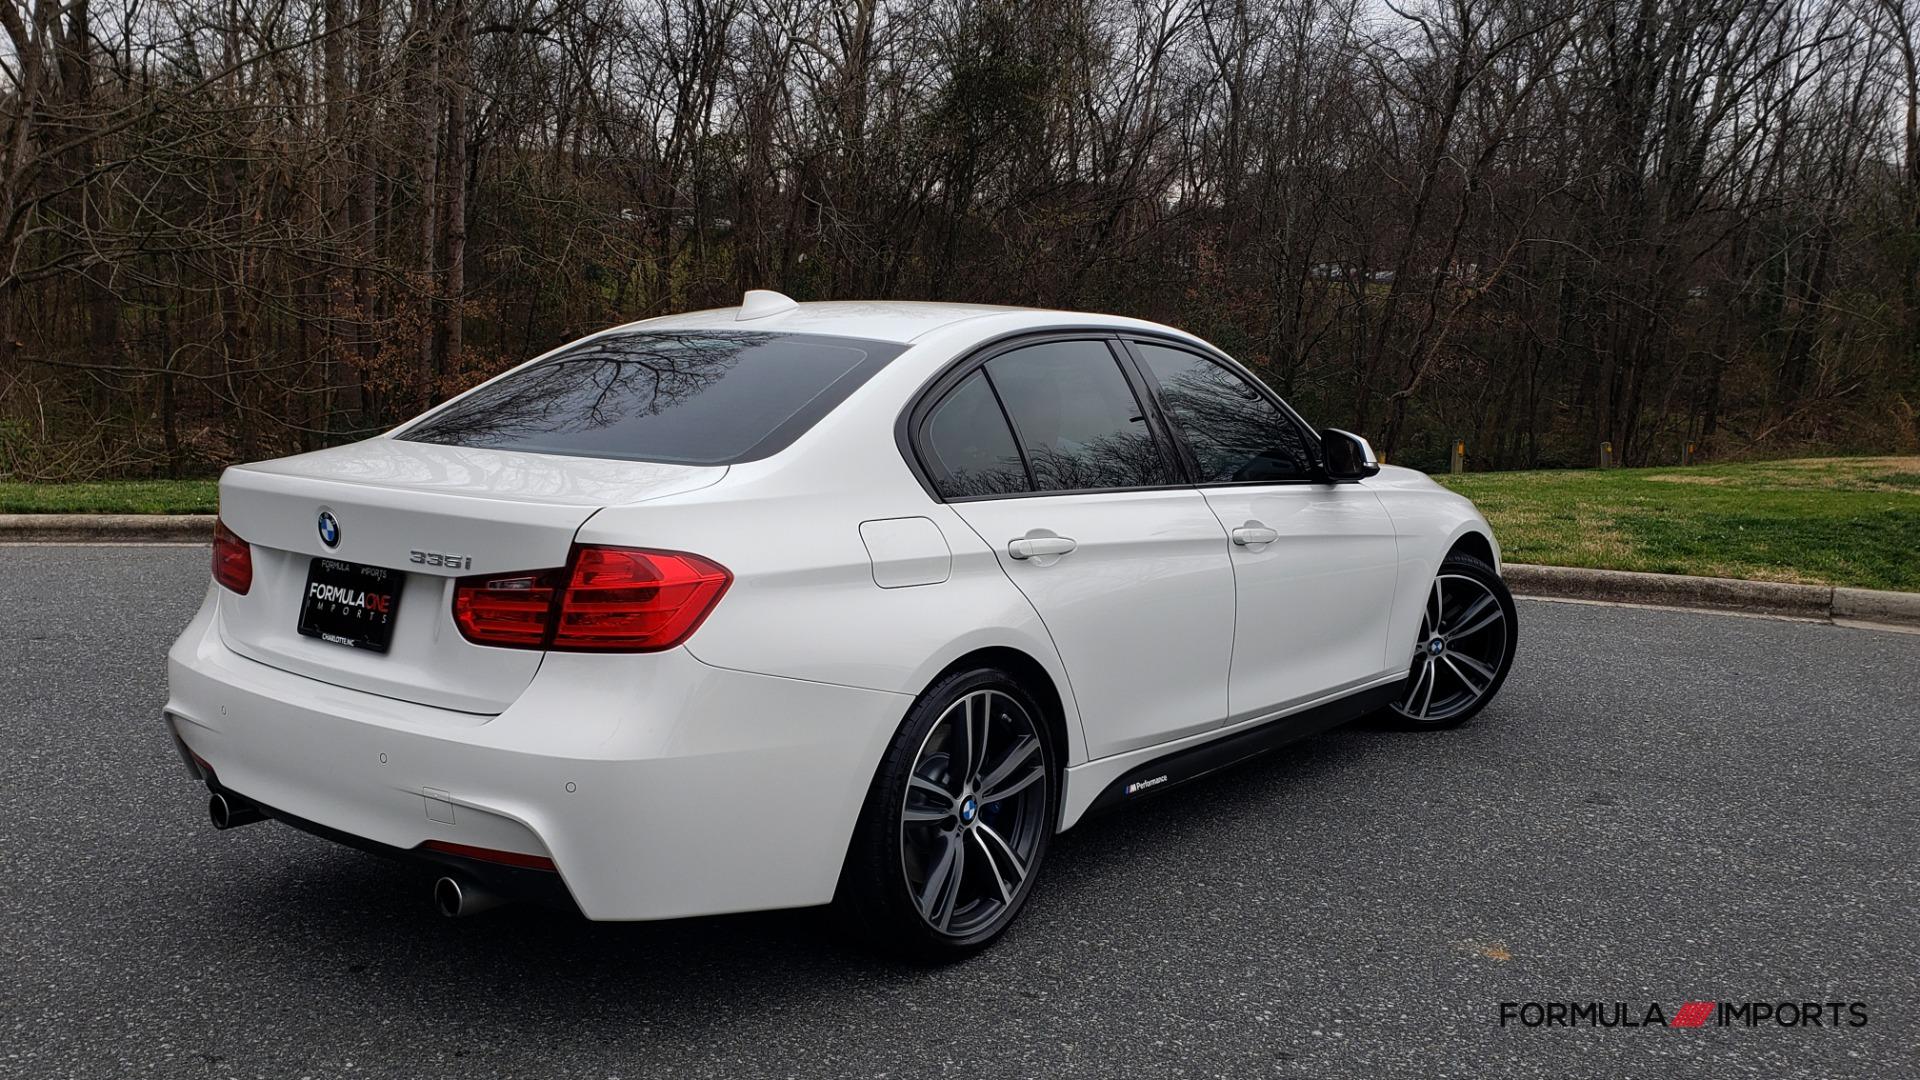 Used 2015 BMW 3 Series 335I M-SPORT / PREM PKG / HK SND / SUNROOF / REARVIEW for sale Sold at Formula Imports in Charlotte NC 28227 6